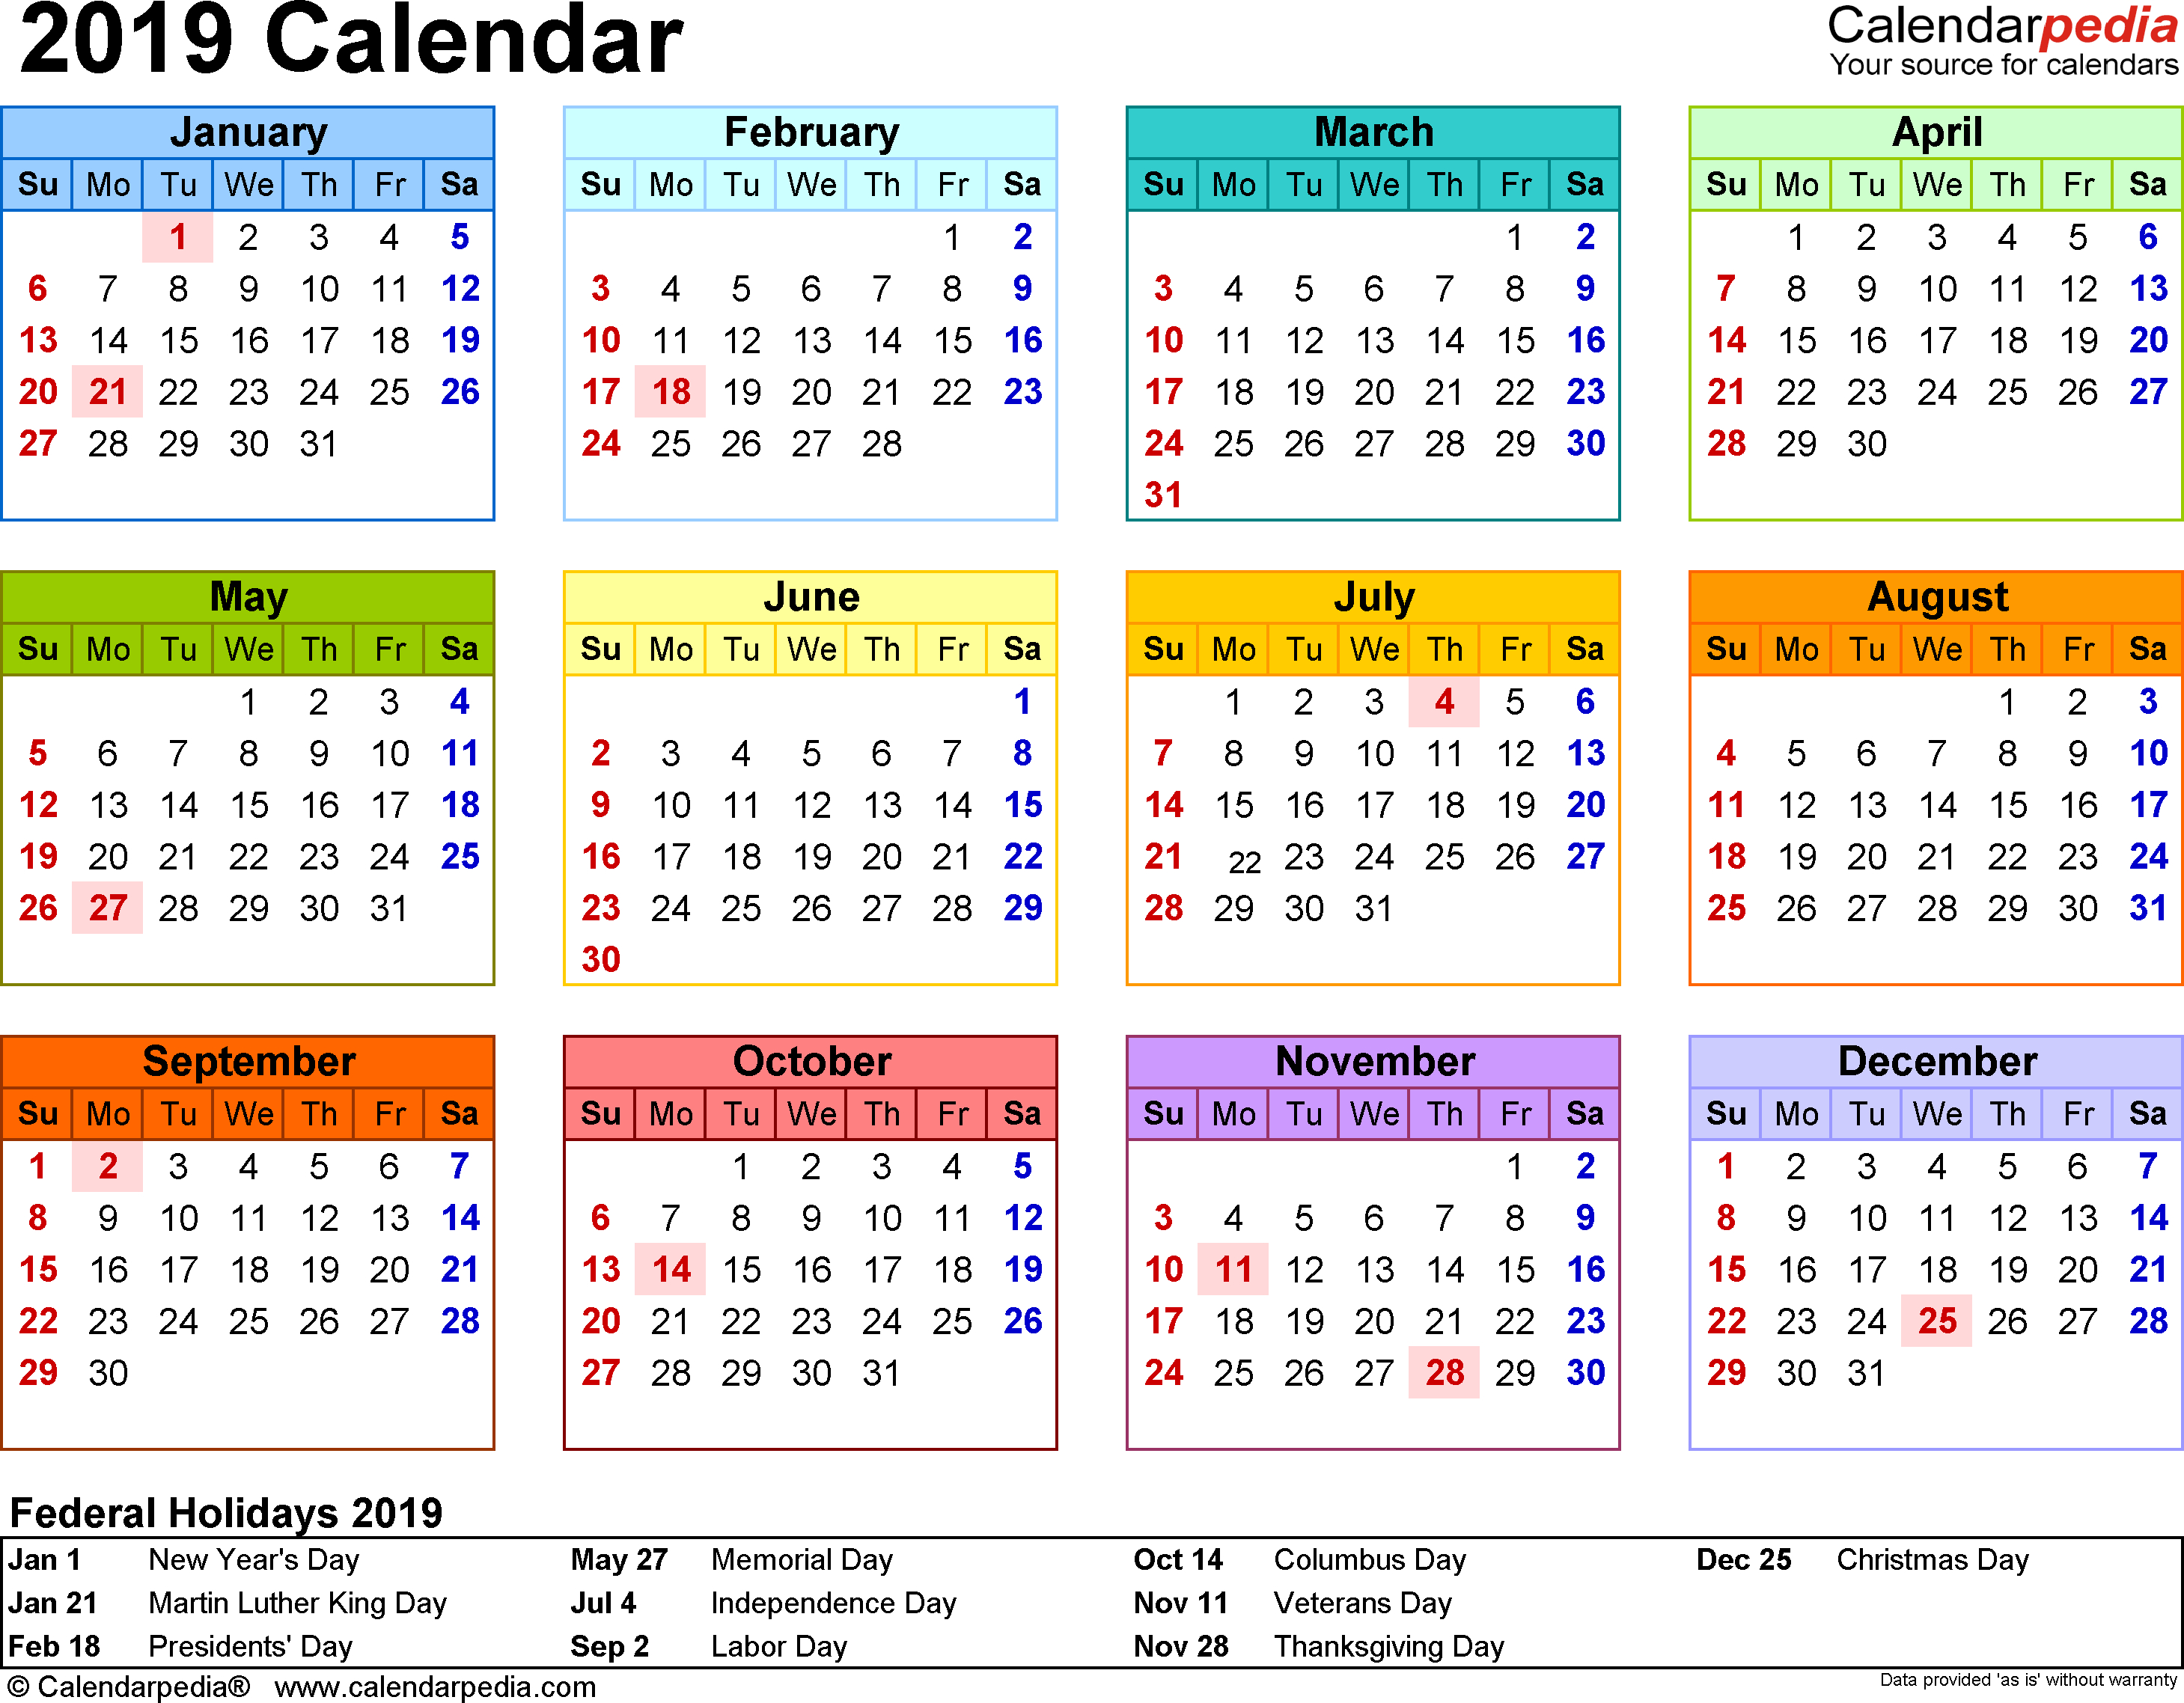 2019 Calendar - 17 Free Printable Word Calendar Templates throughout Cute Yearly Calendar Template